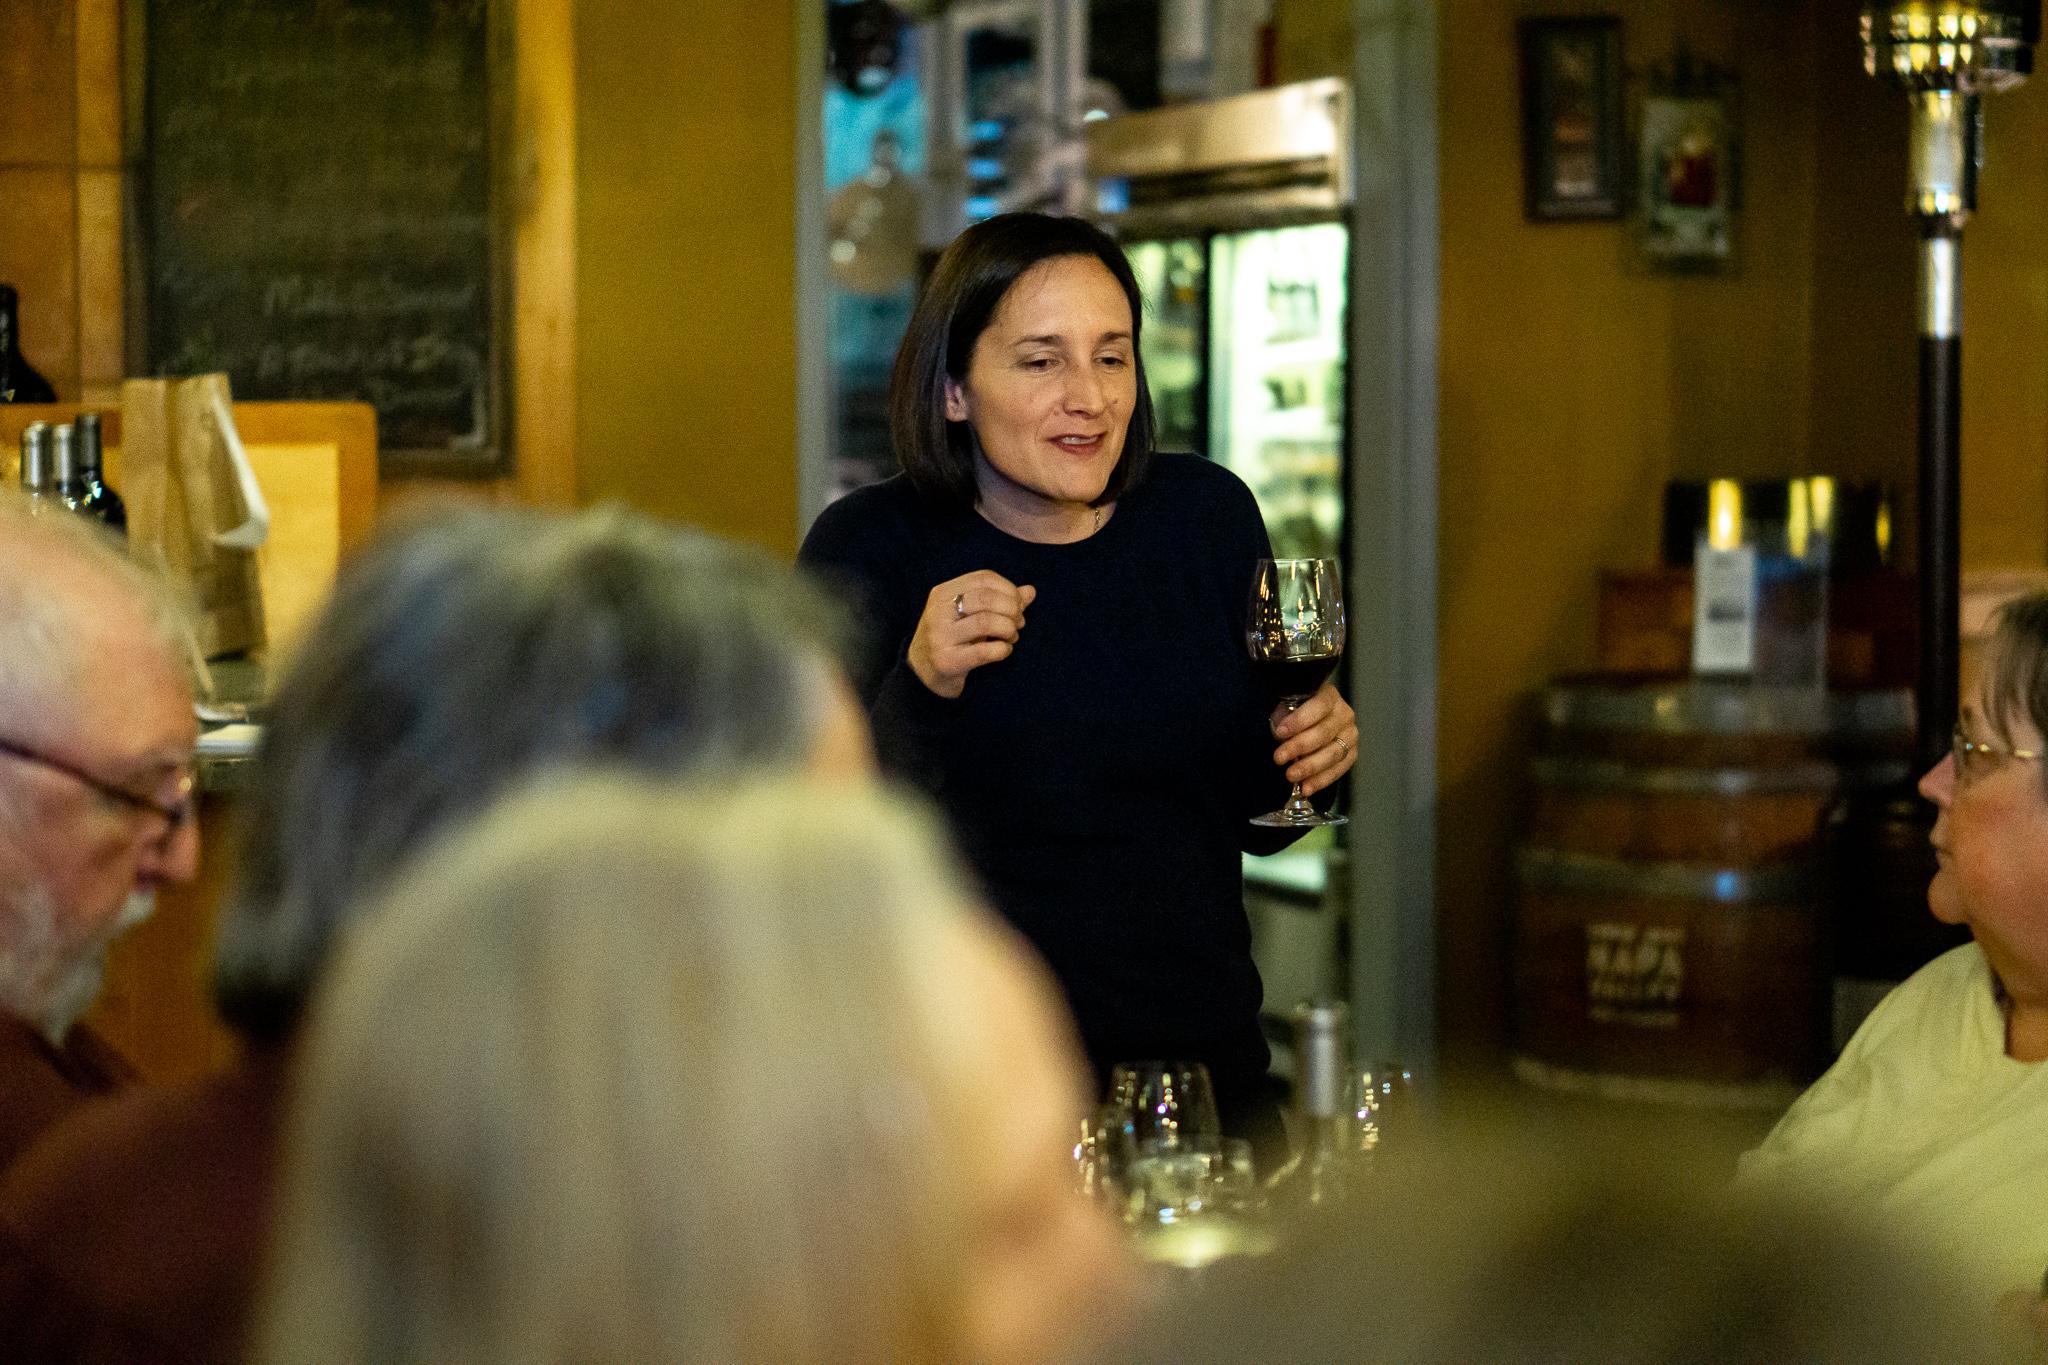 wine-maestro-the-sassy-gourmet-wine89.jpg